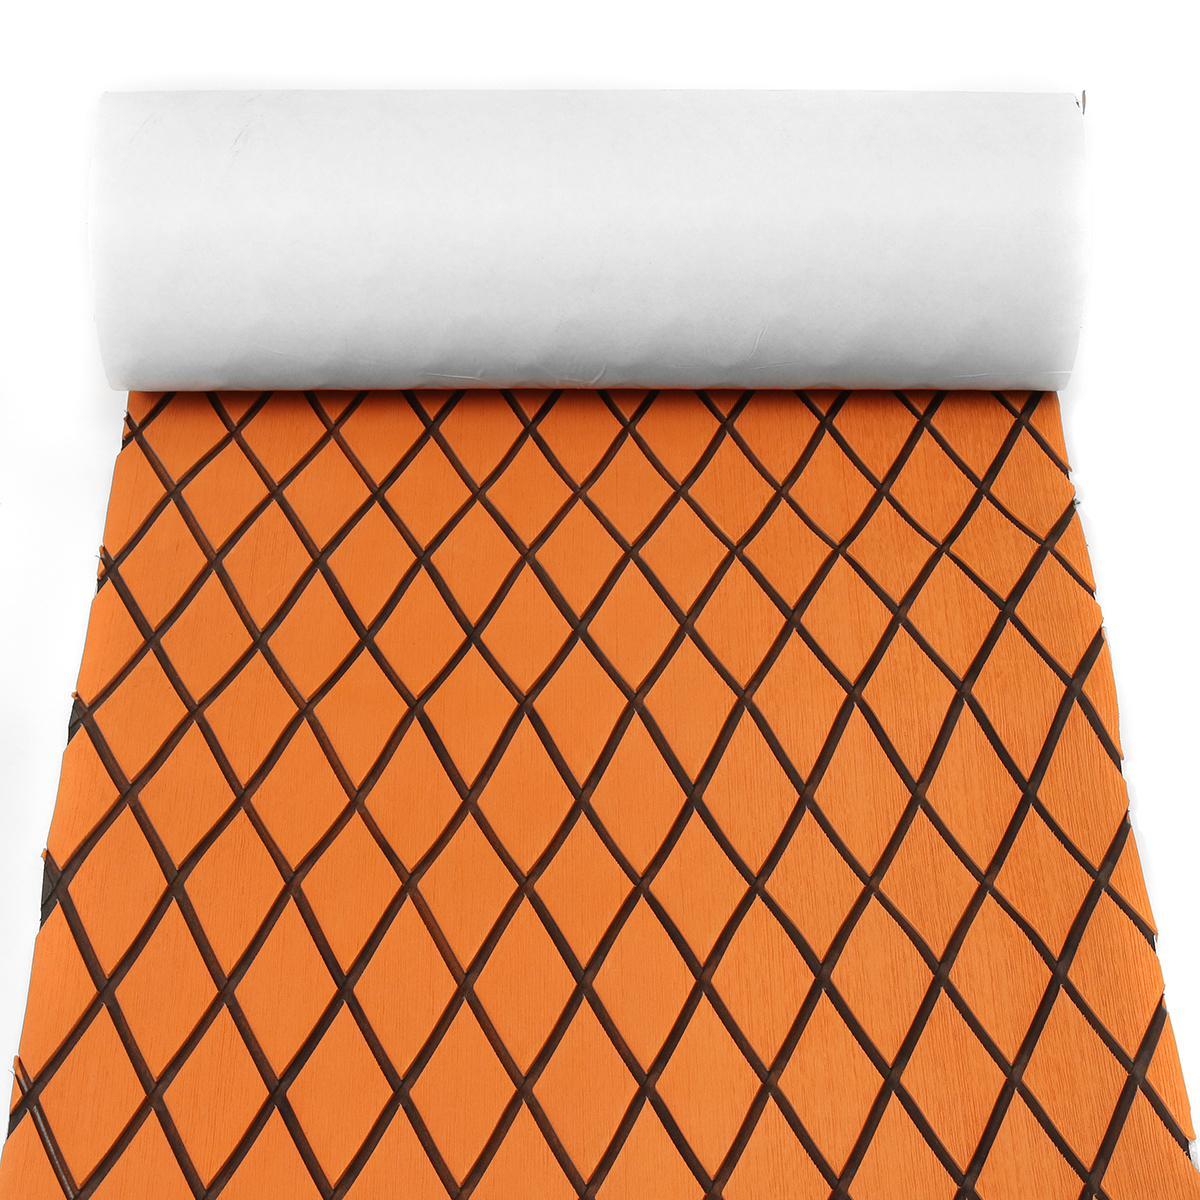 60CMx190CM EVA Foam Marine Teak Sheet Touring Car Mat <font><b>Flooring</b></font> Synthetic Boat Decking Yacht Orange + Black Pad